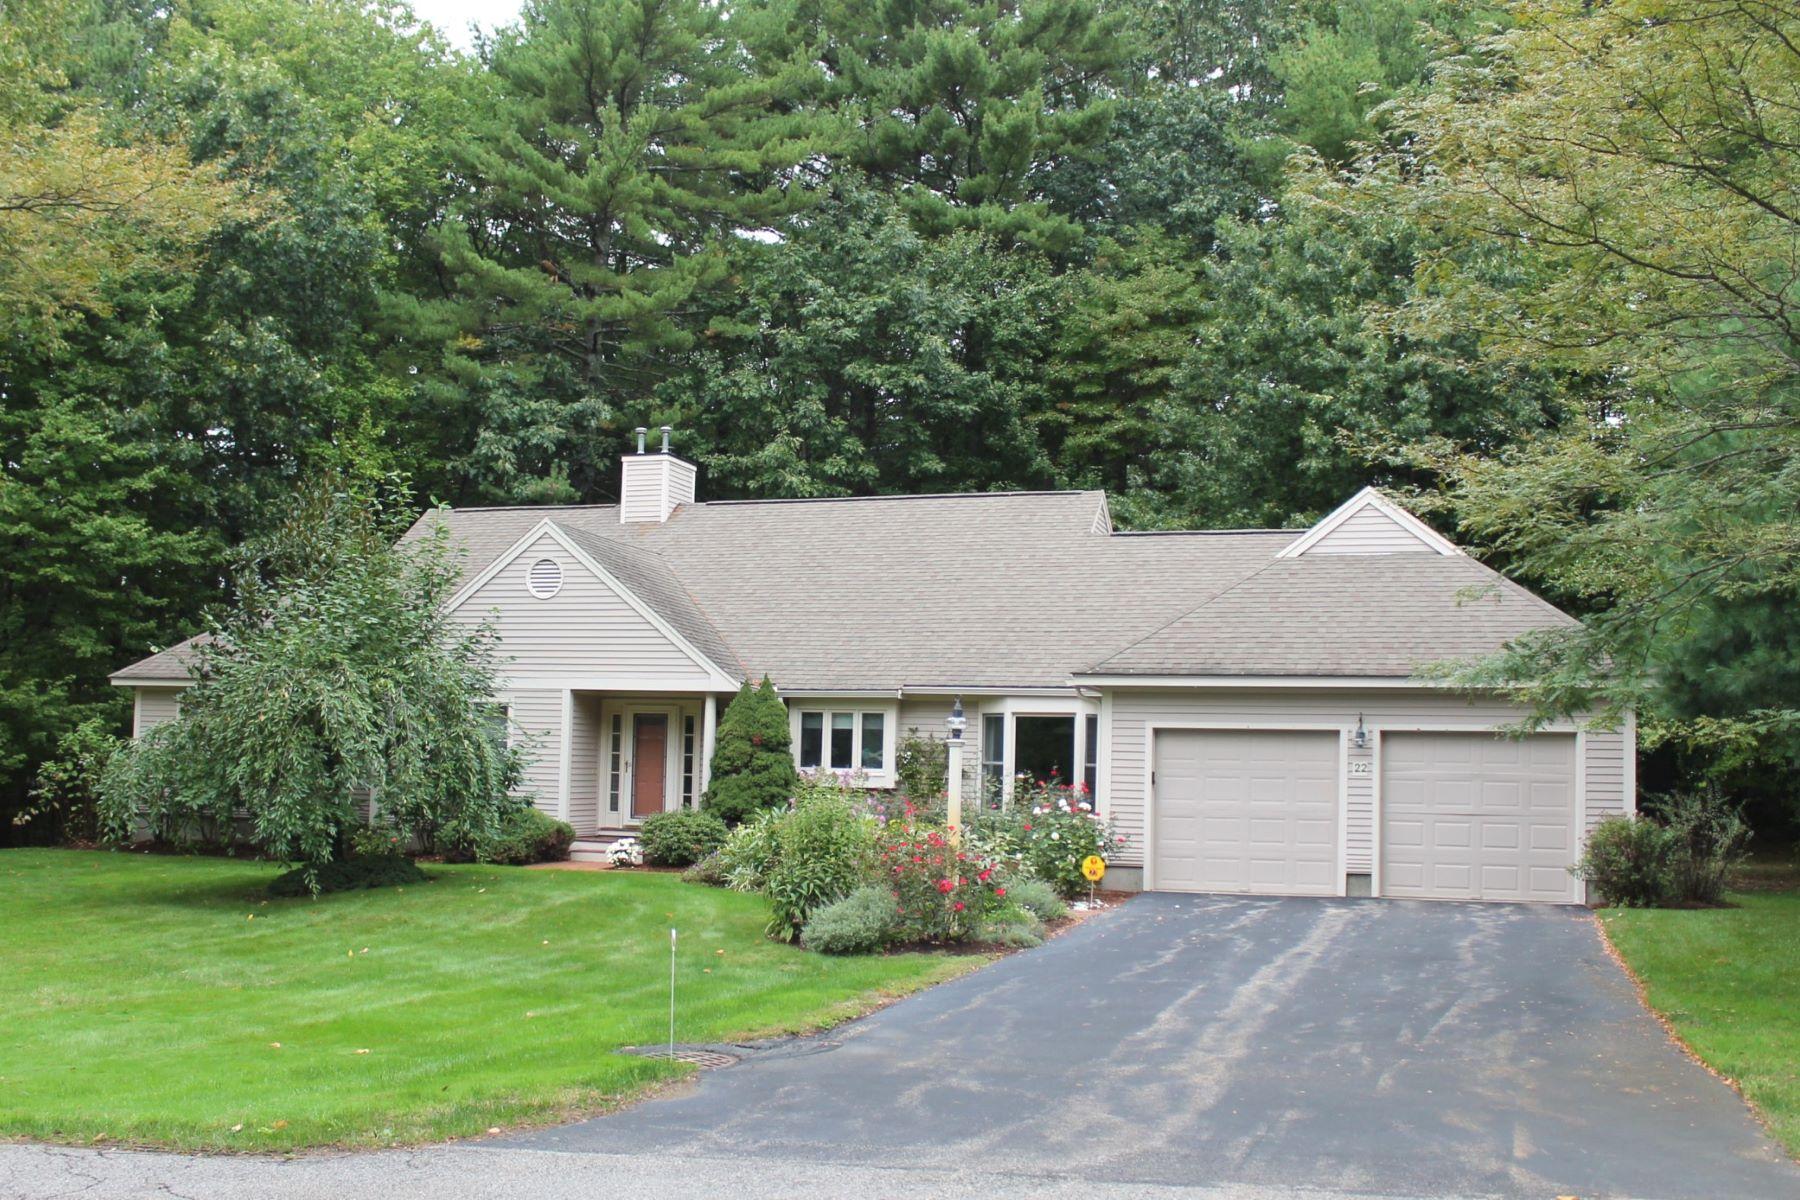 Condominium for Sale at Huckins Farm 22 Pickman Drive Bedford, Massachusetts, 01730 United States